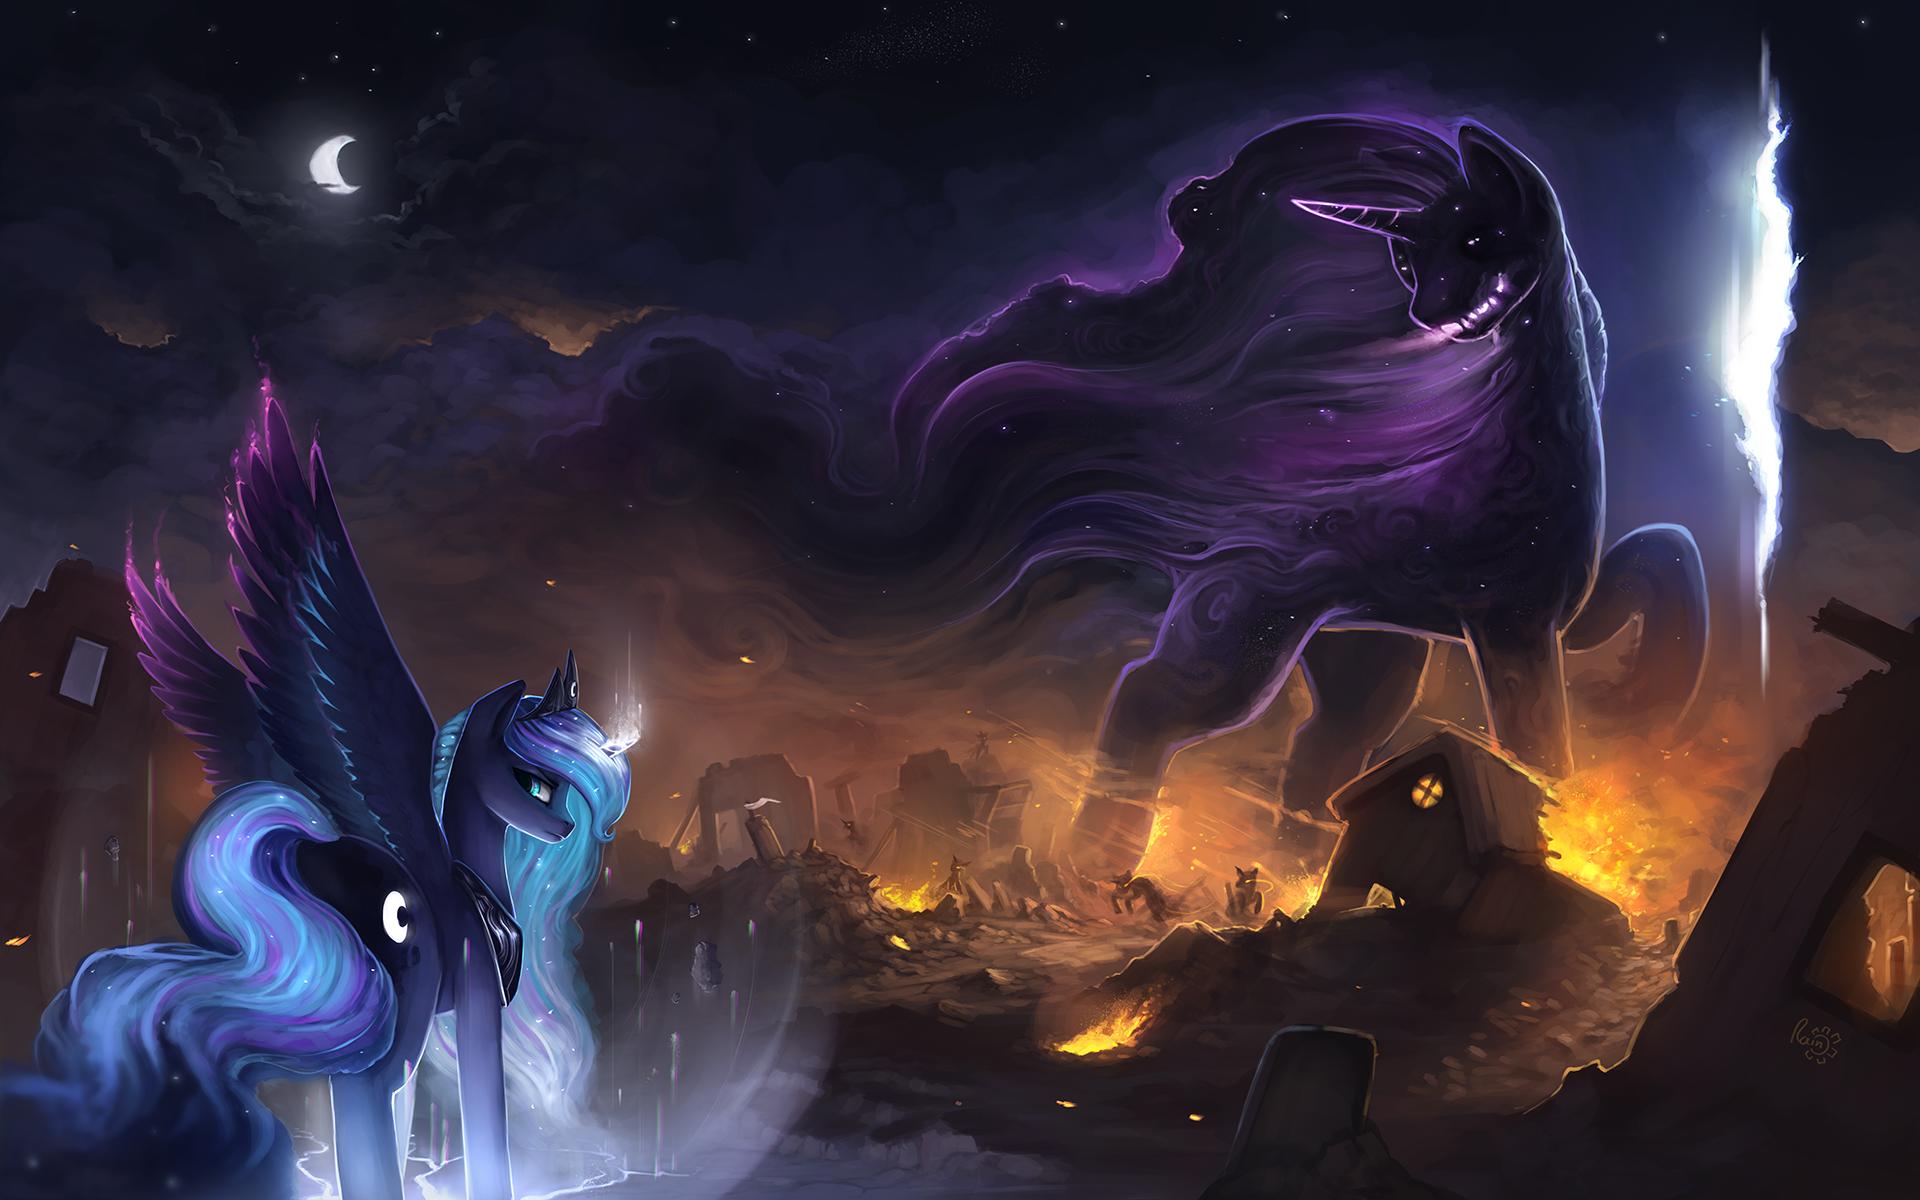 Princess Celestia Luna Rarity Rainbow Dash Pony Purple Darkness Mythology Horse Like Mammal Dragon Mythical